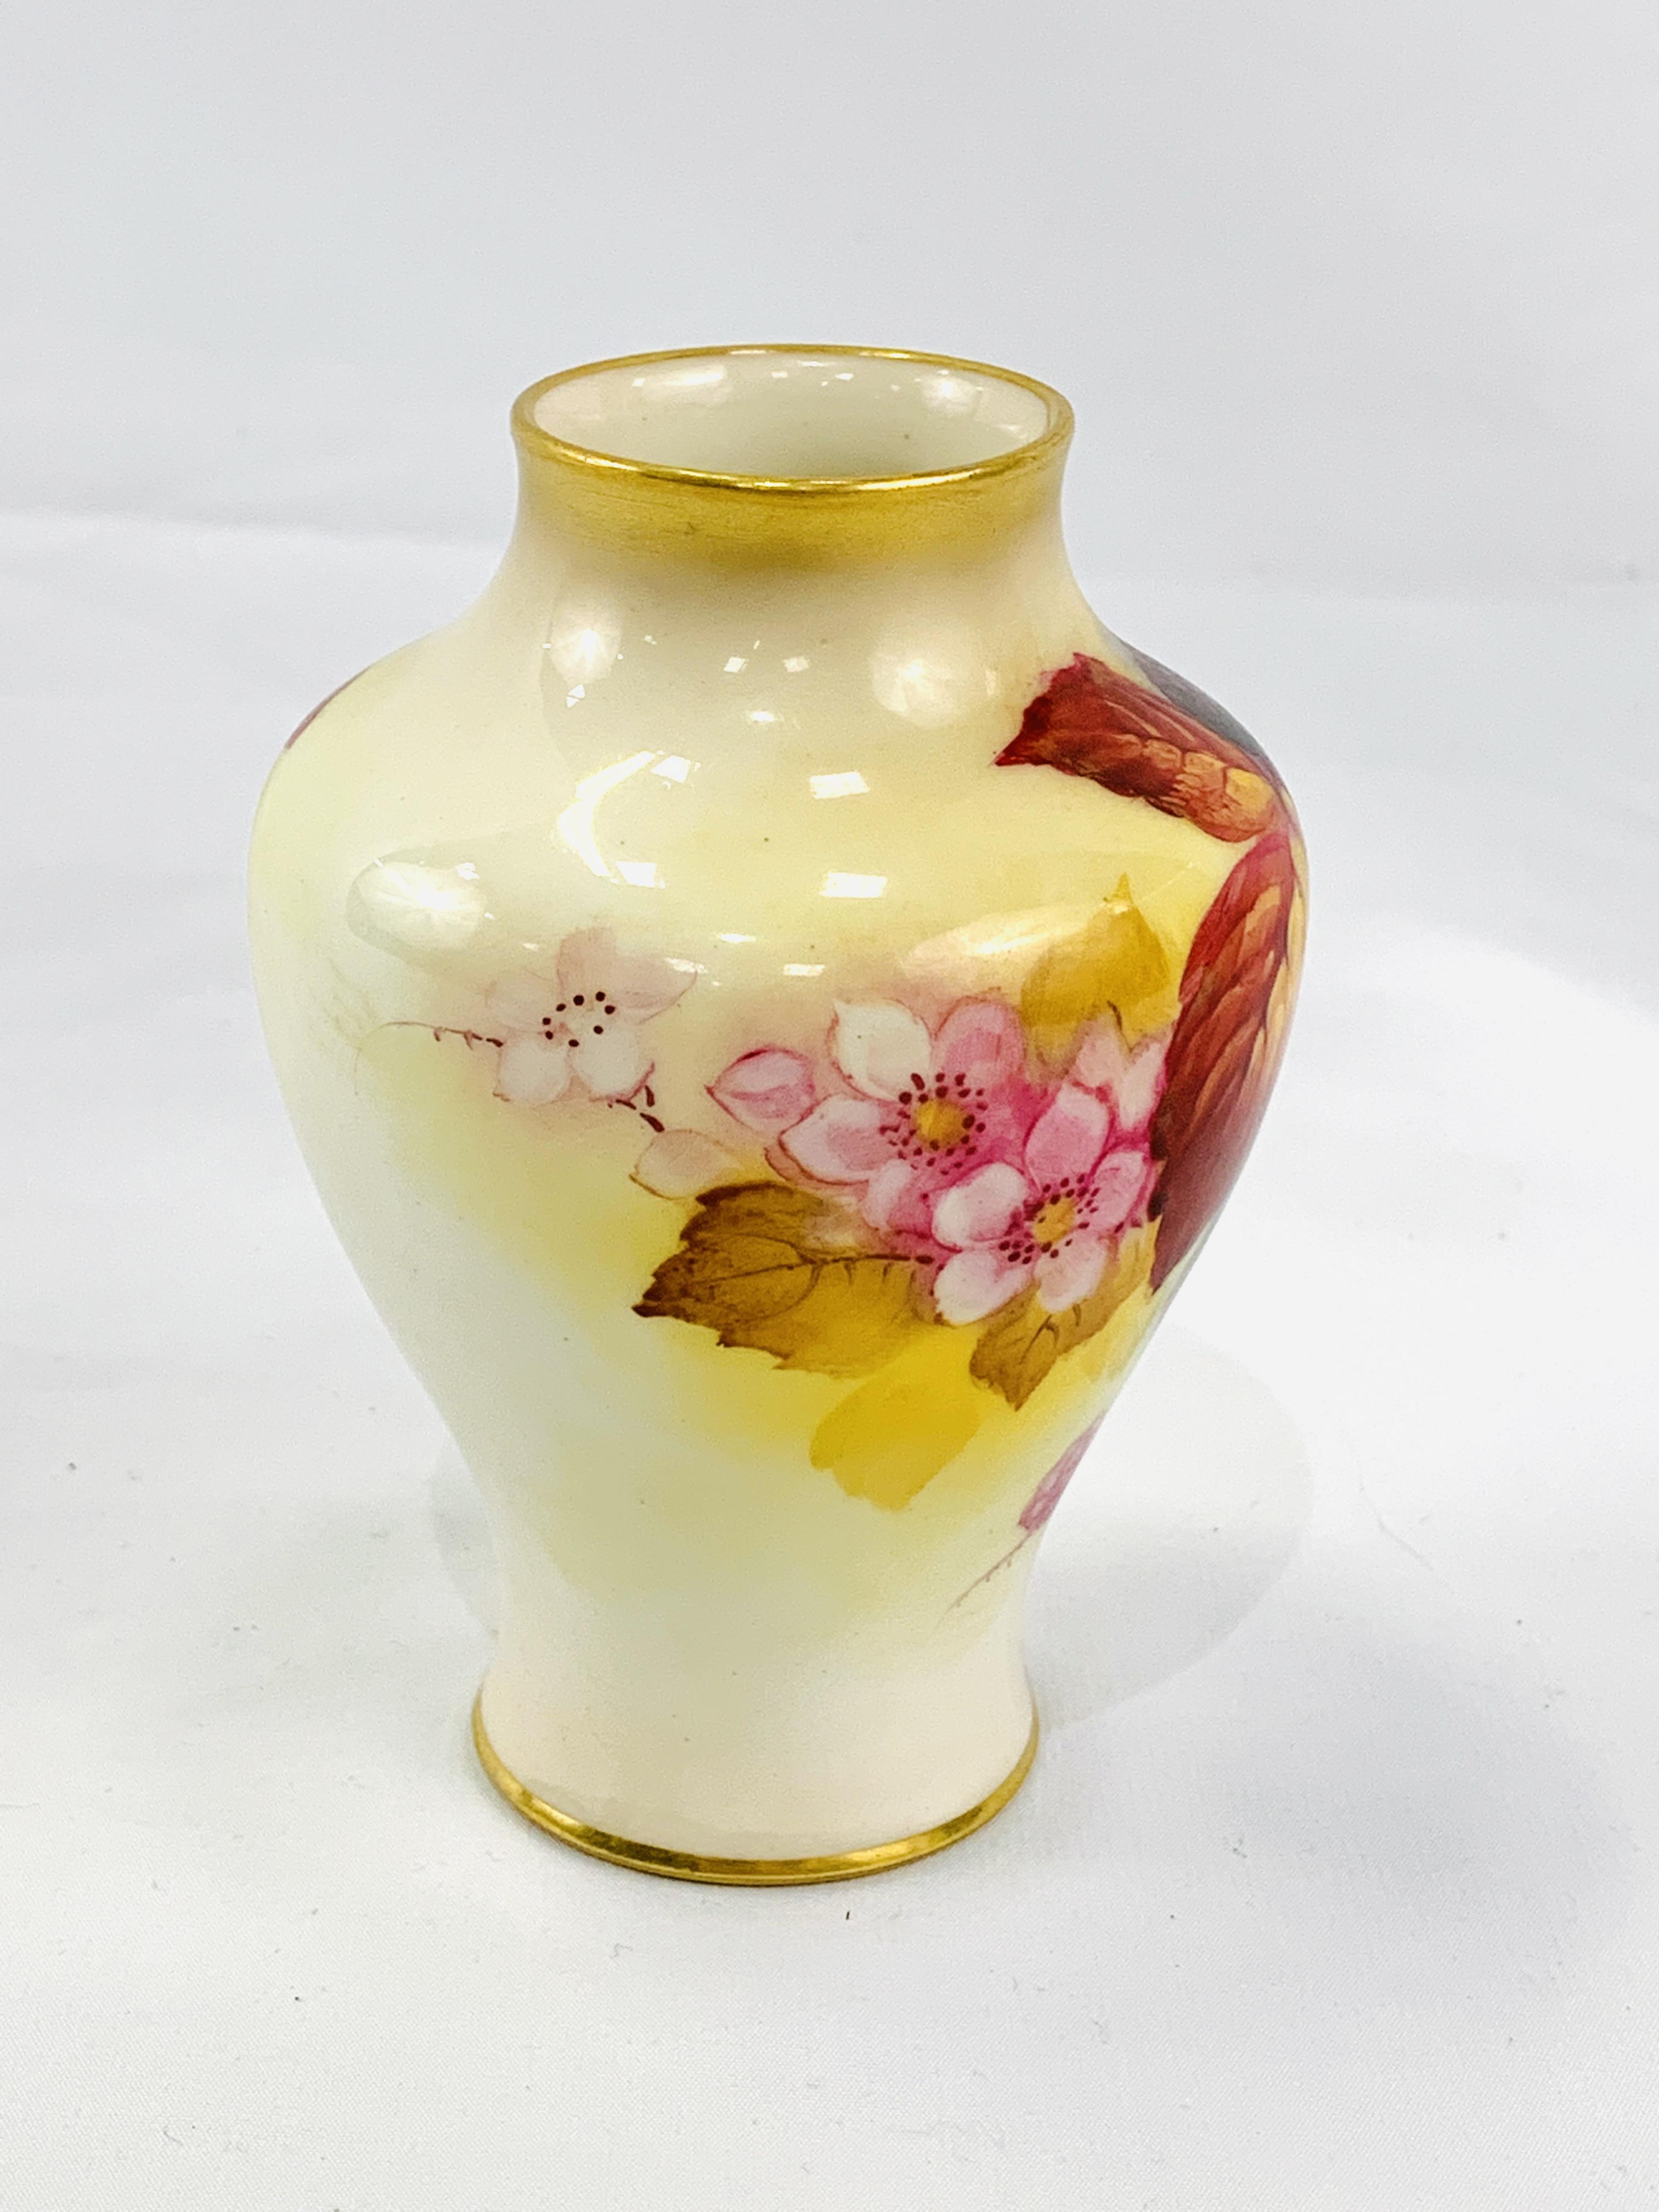 Royal Worcester vase hand-painted with blackberries by J Blake - Image 4 of 5